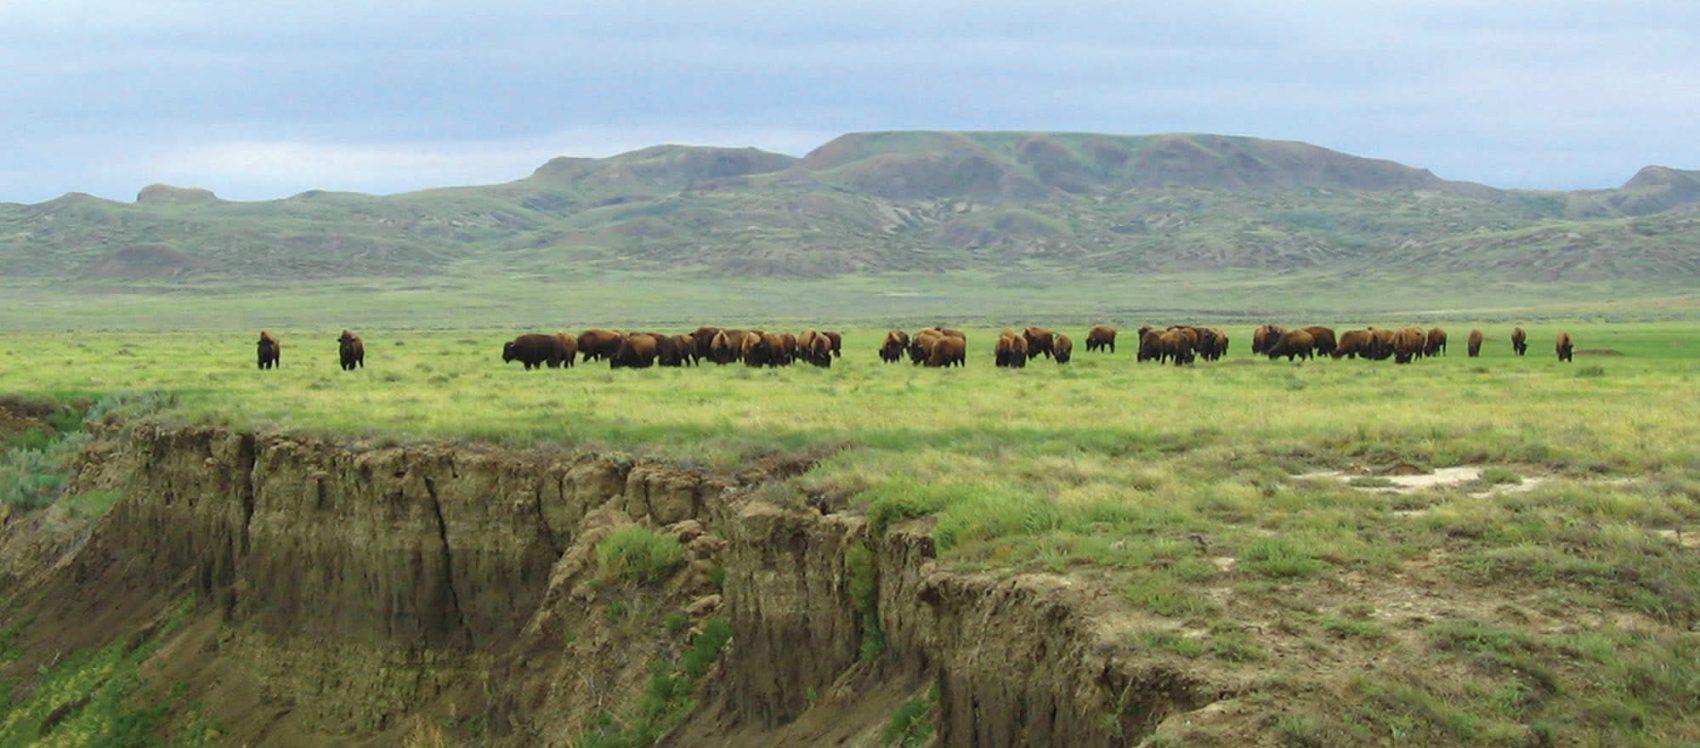 Bison Herd Grasslands National Park Saskatchewan